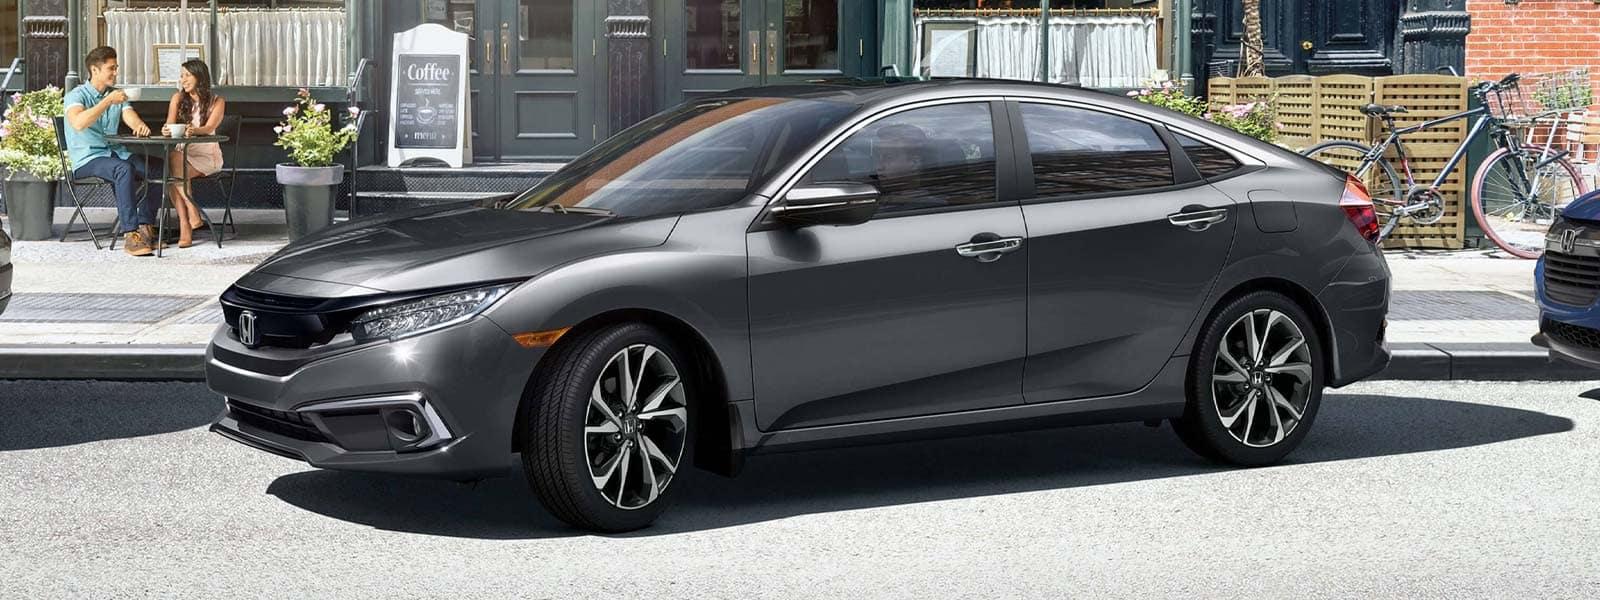 Buy new 2021 Honda Civic in Martinsville Virginia